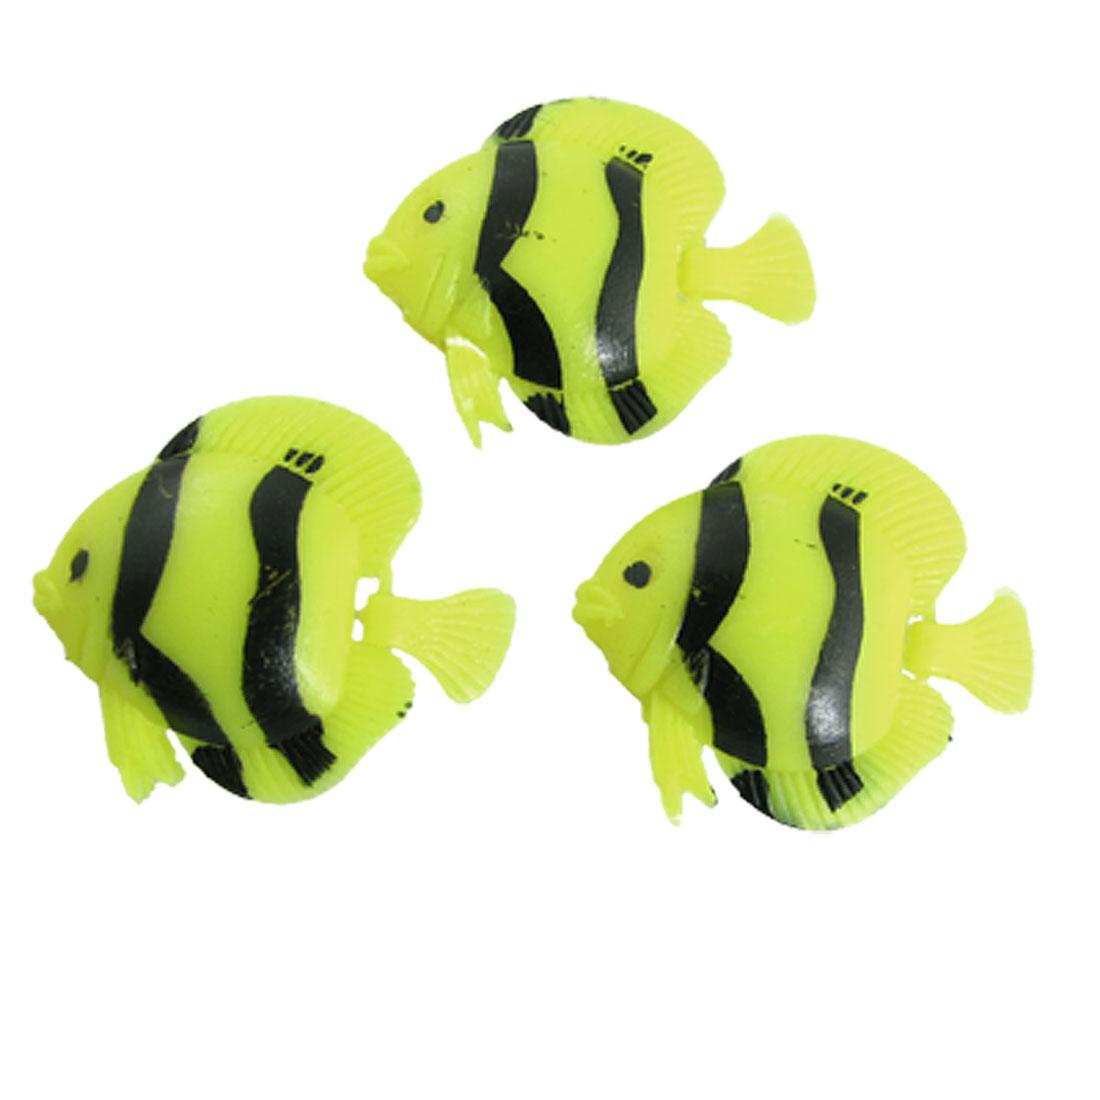 3Pcs Tank Aquarium Yellow Black Plastic Floating Fish Decoration